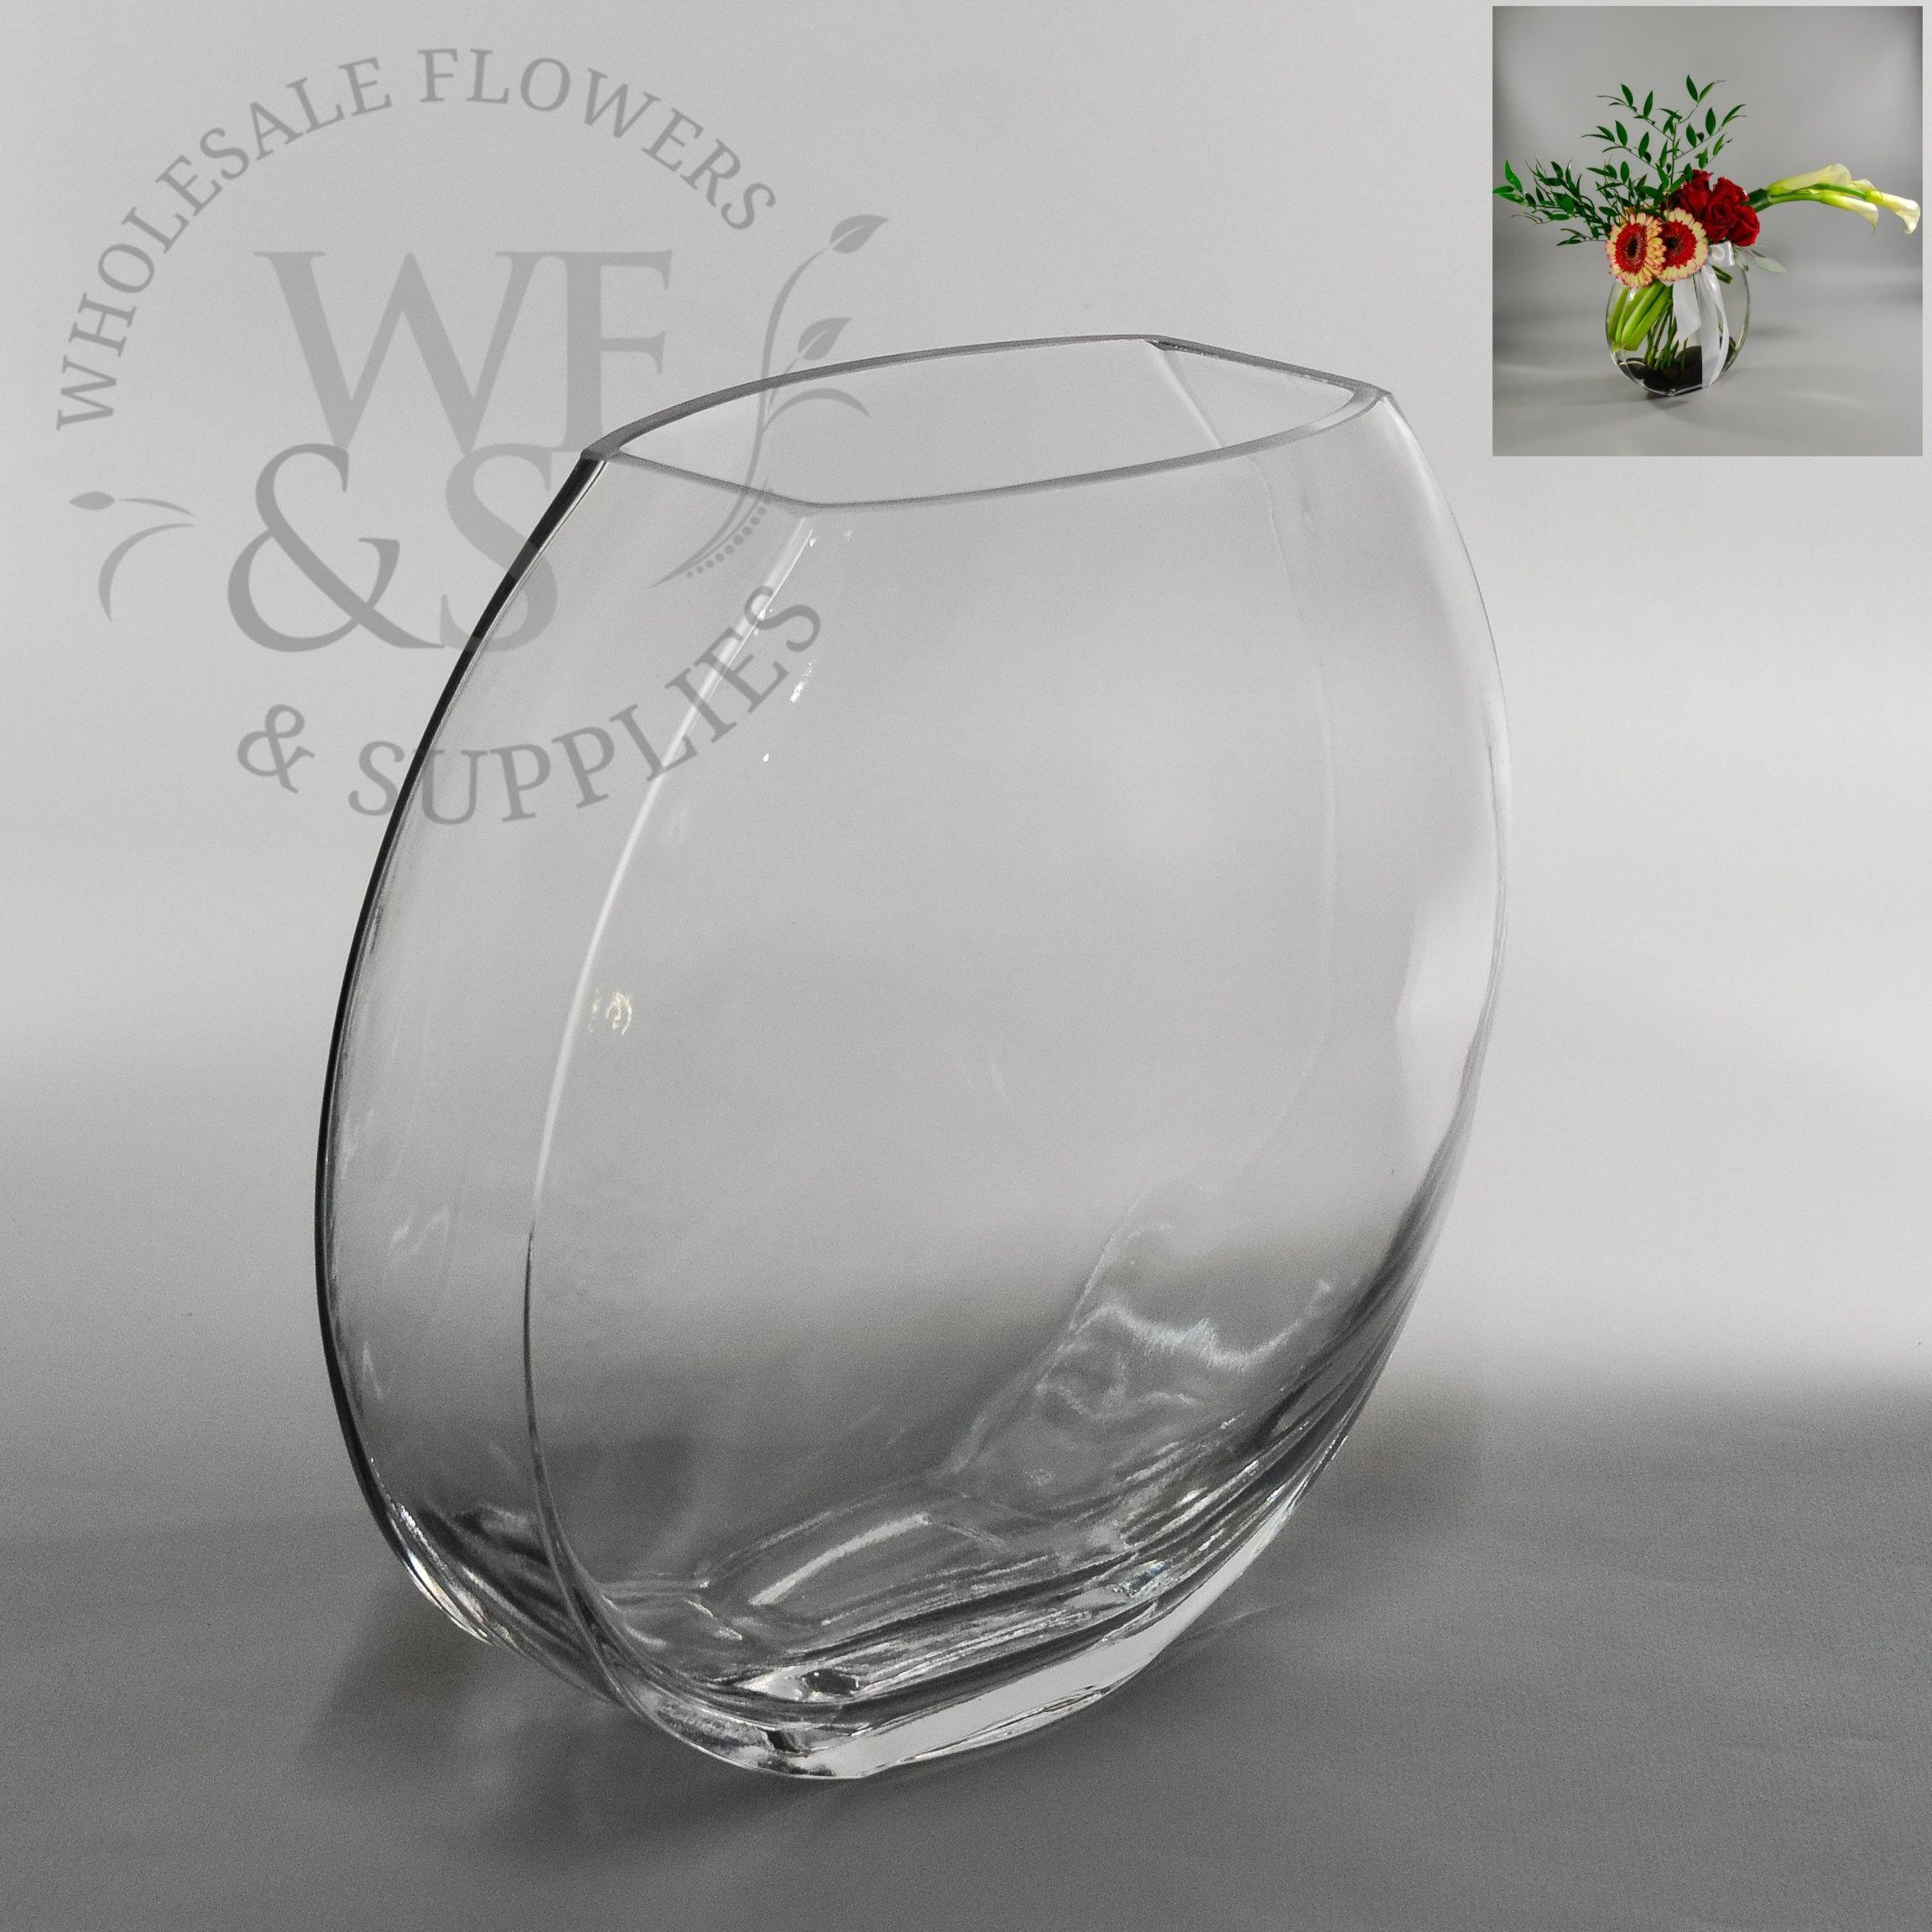 Flat sided fish bowl 9 tall bowls and fish flat sided fish bowl 9 tall wholesaleflowersandsupplies glass vases reviewsmspy